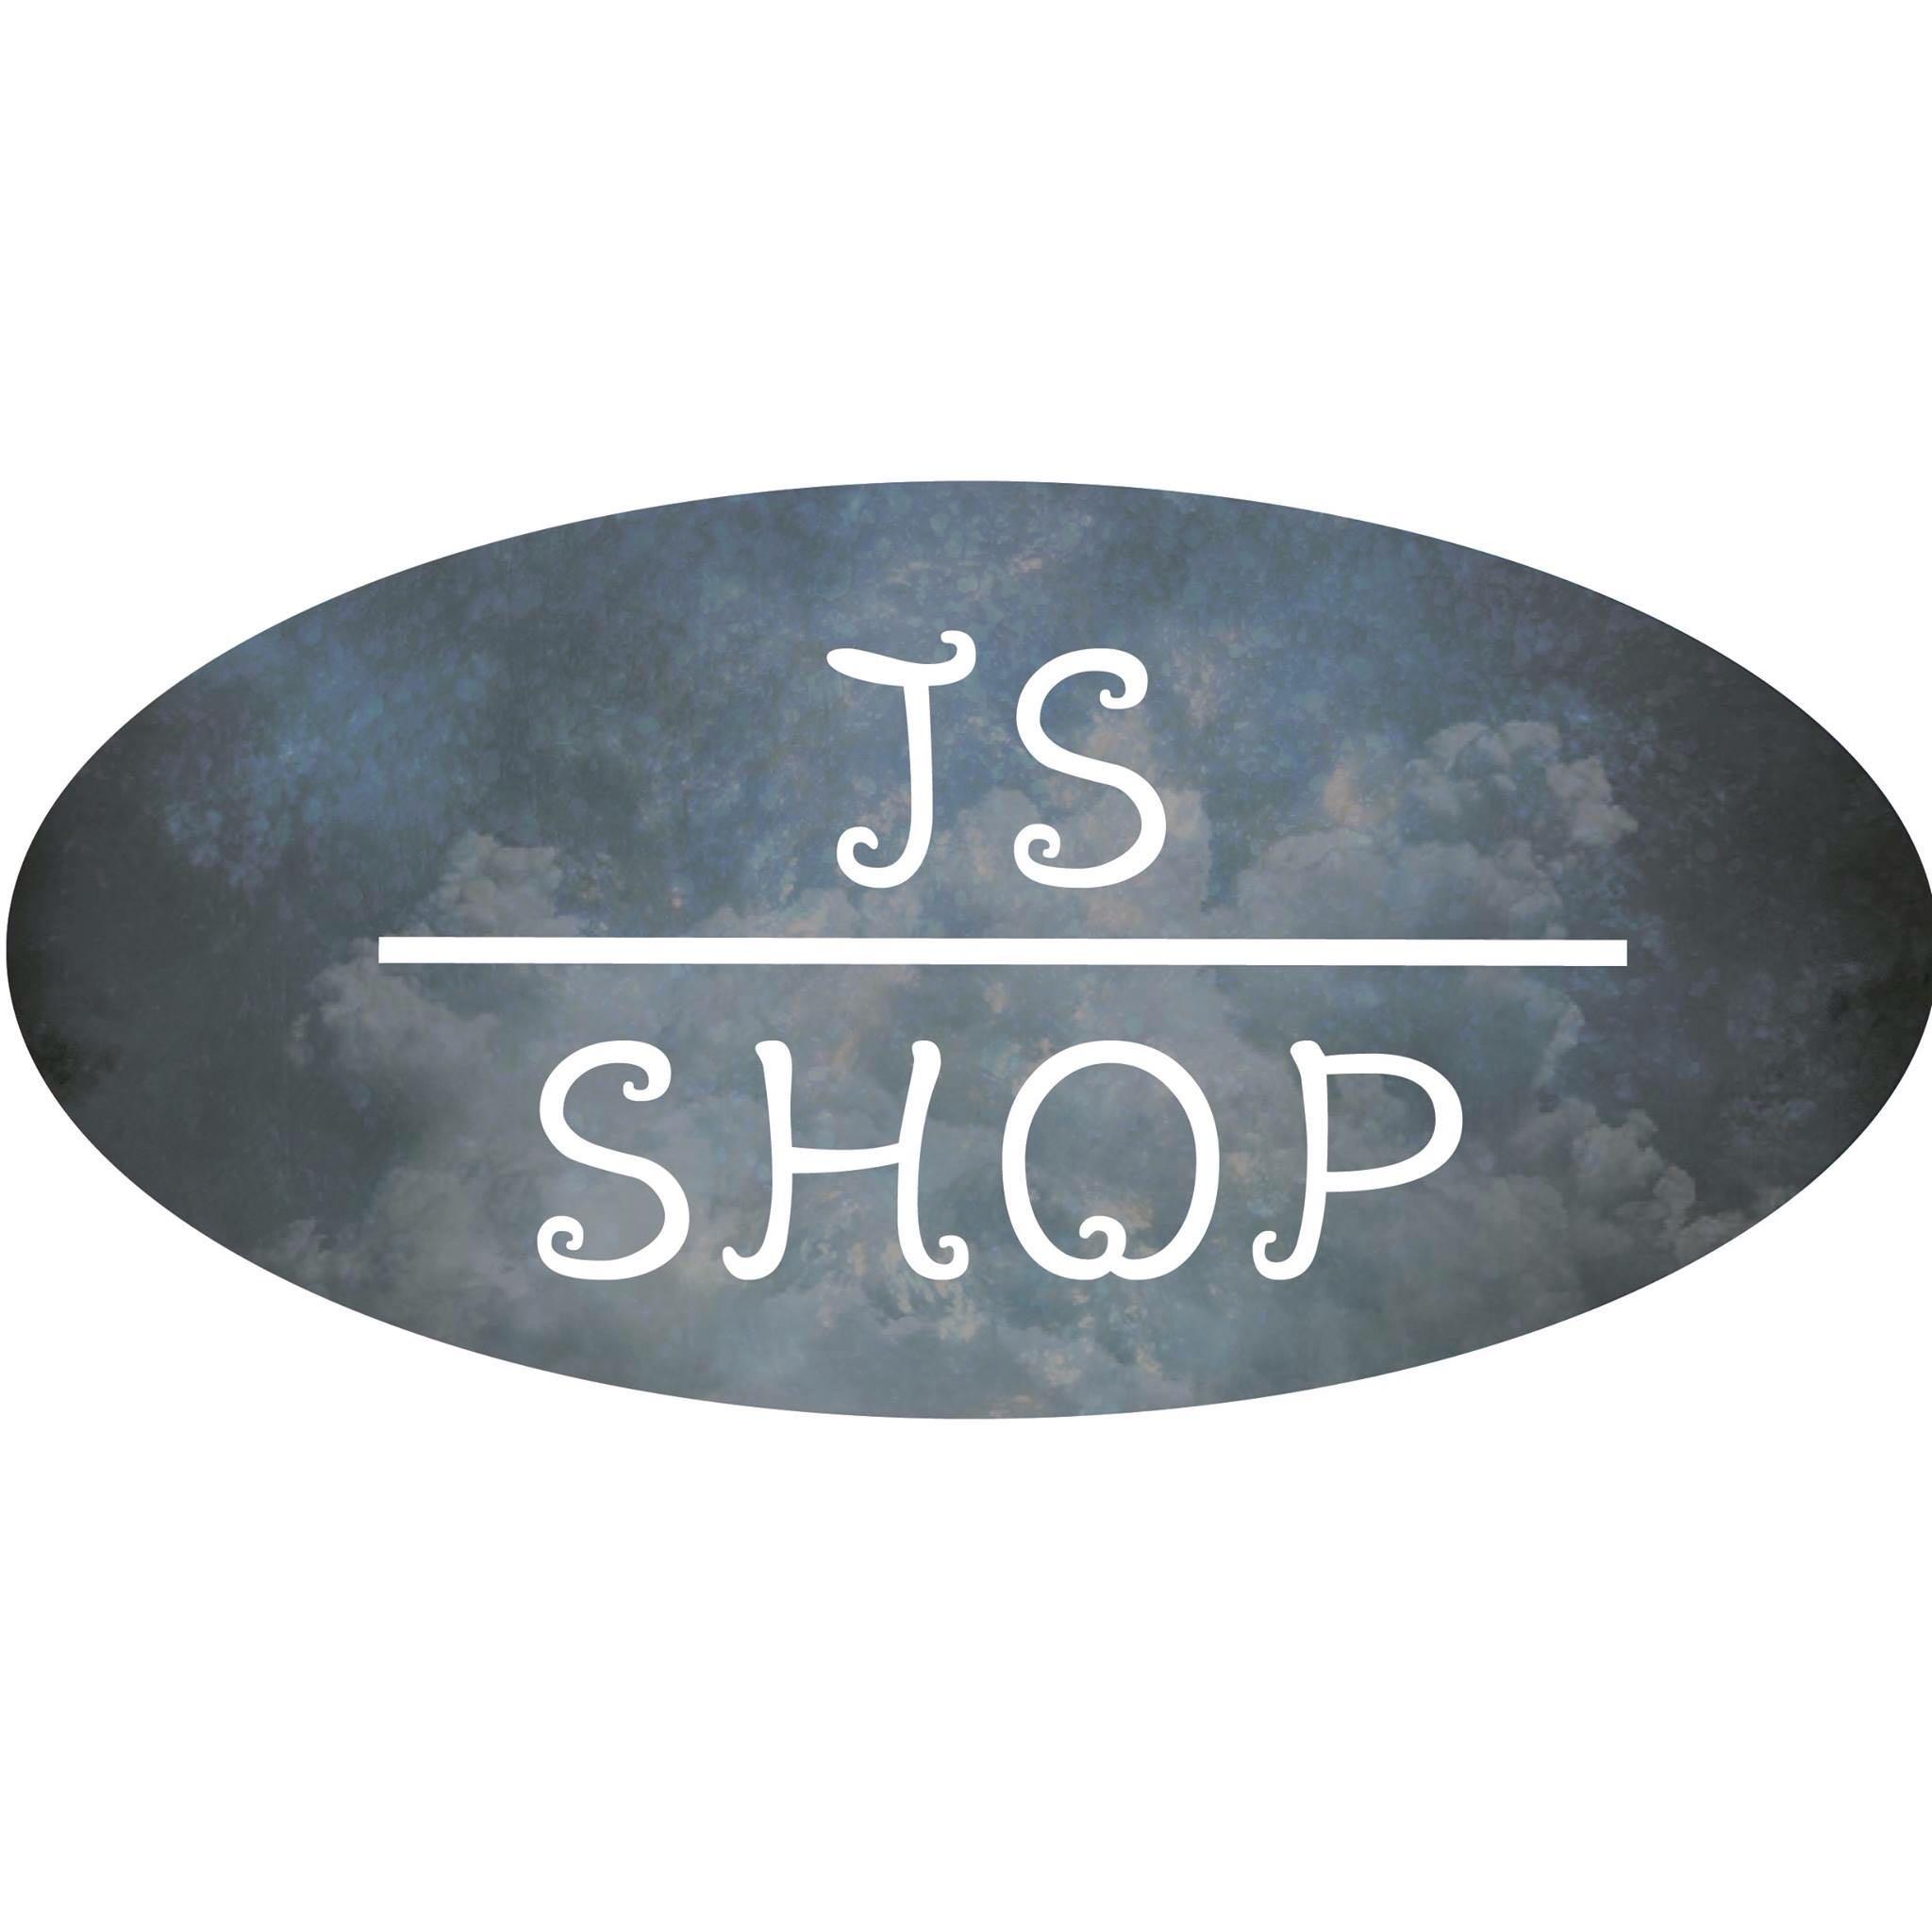 jsshopppp